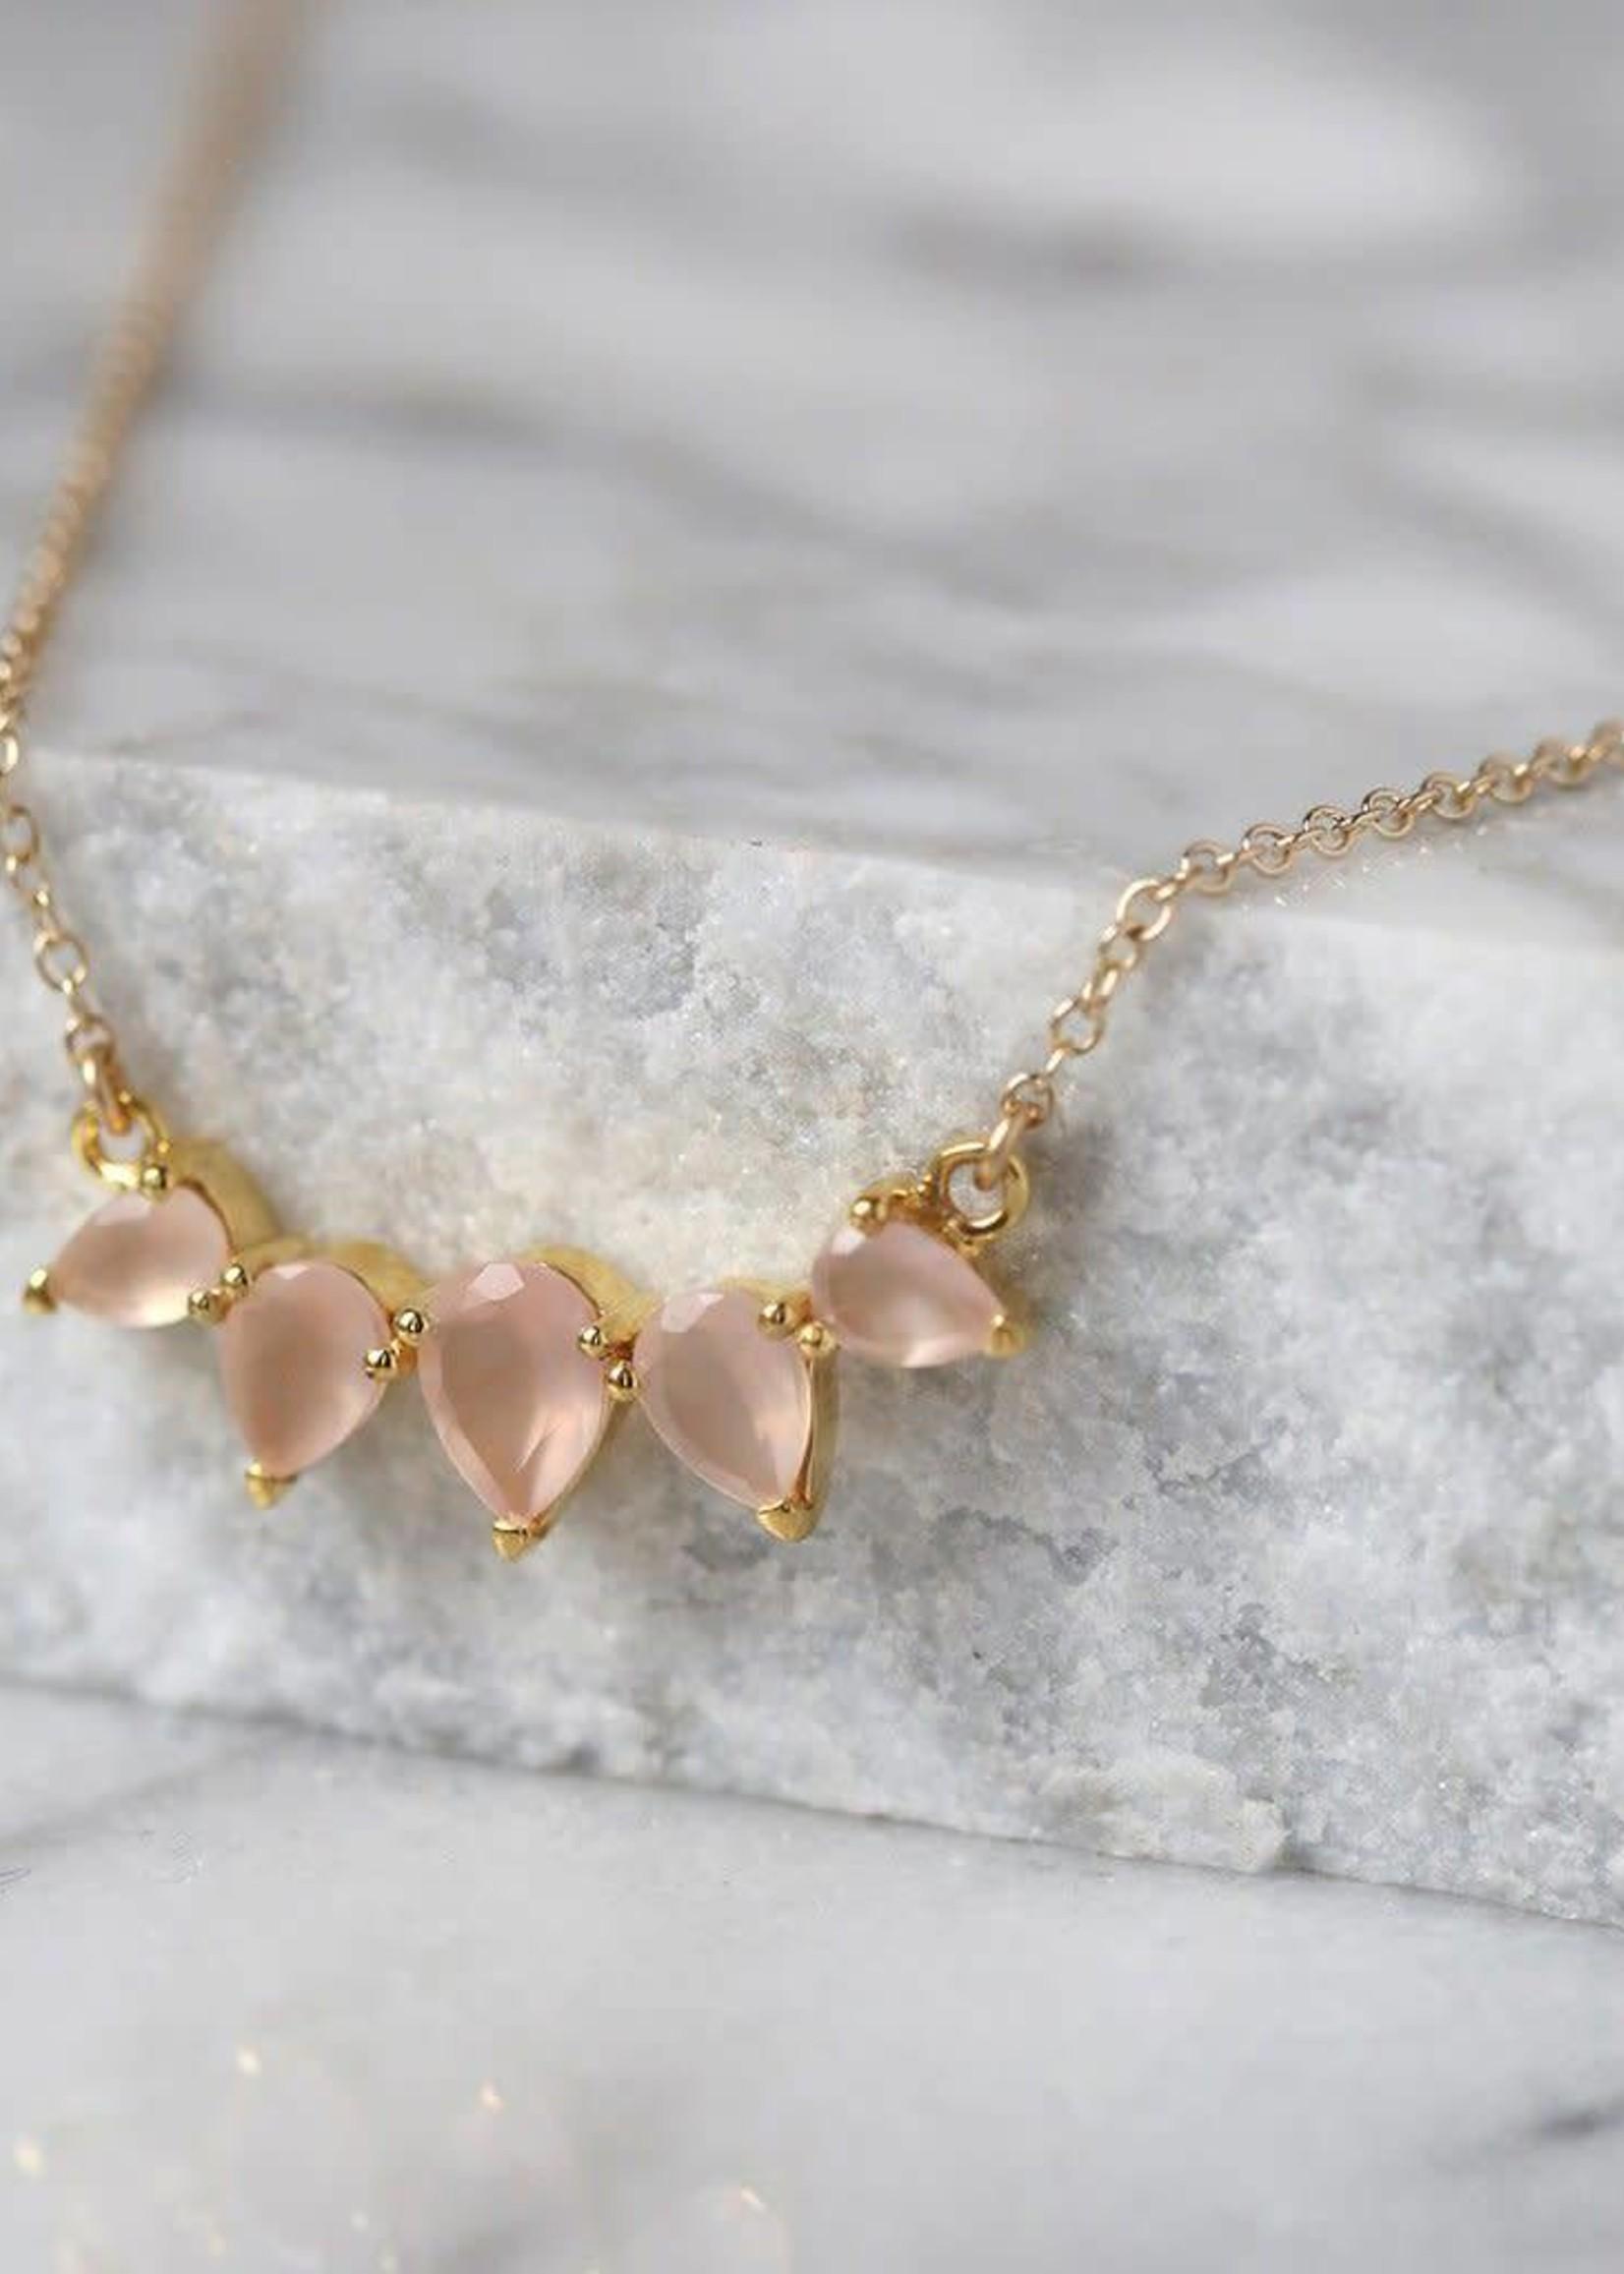 LEAH ALEXANDRA SUNNY necklace, PINK CHALCEDONY